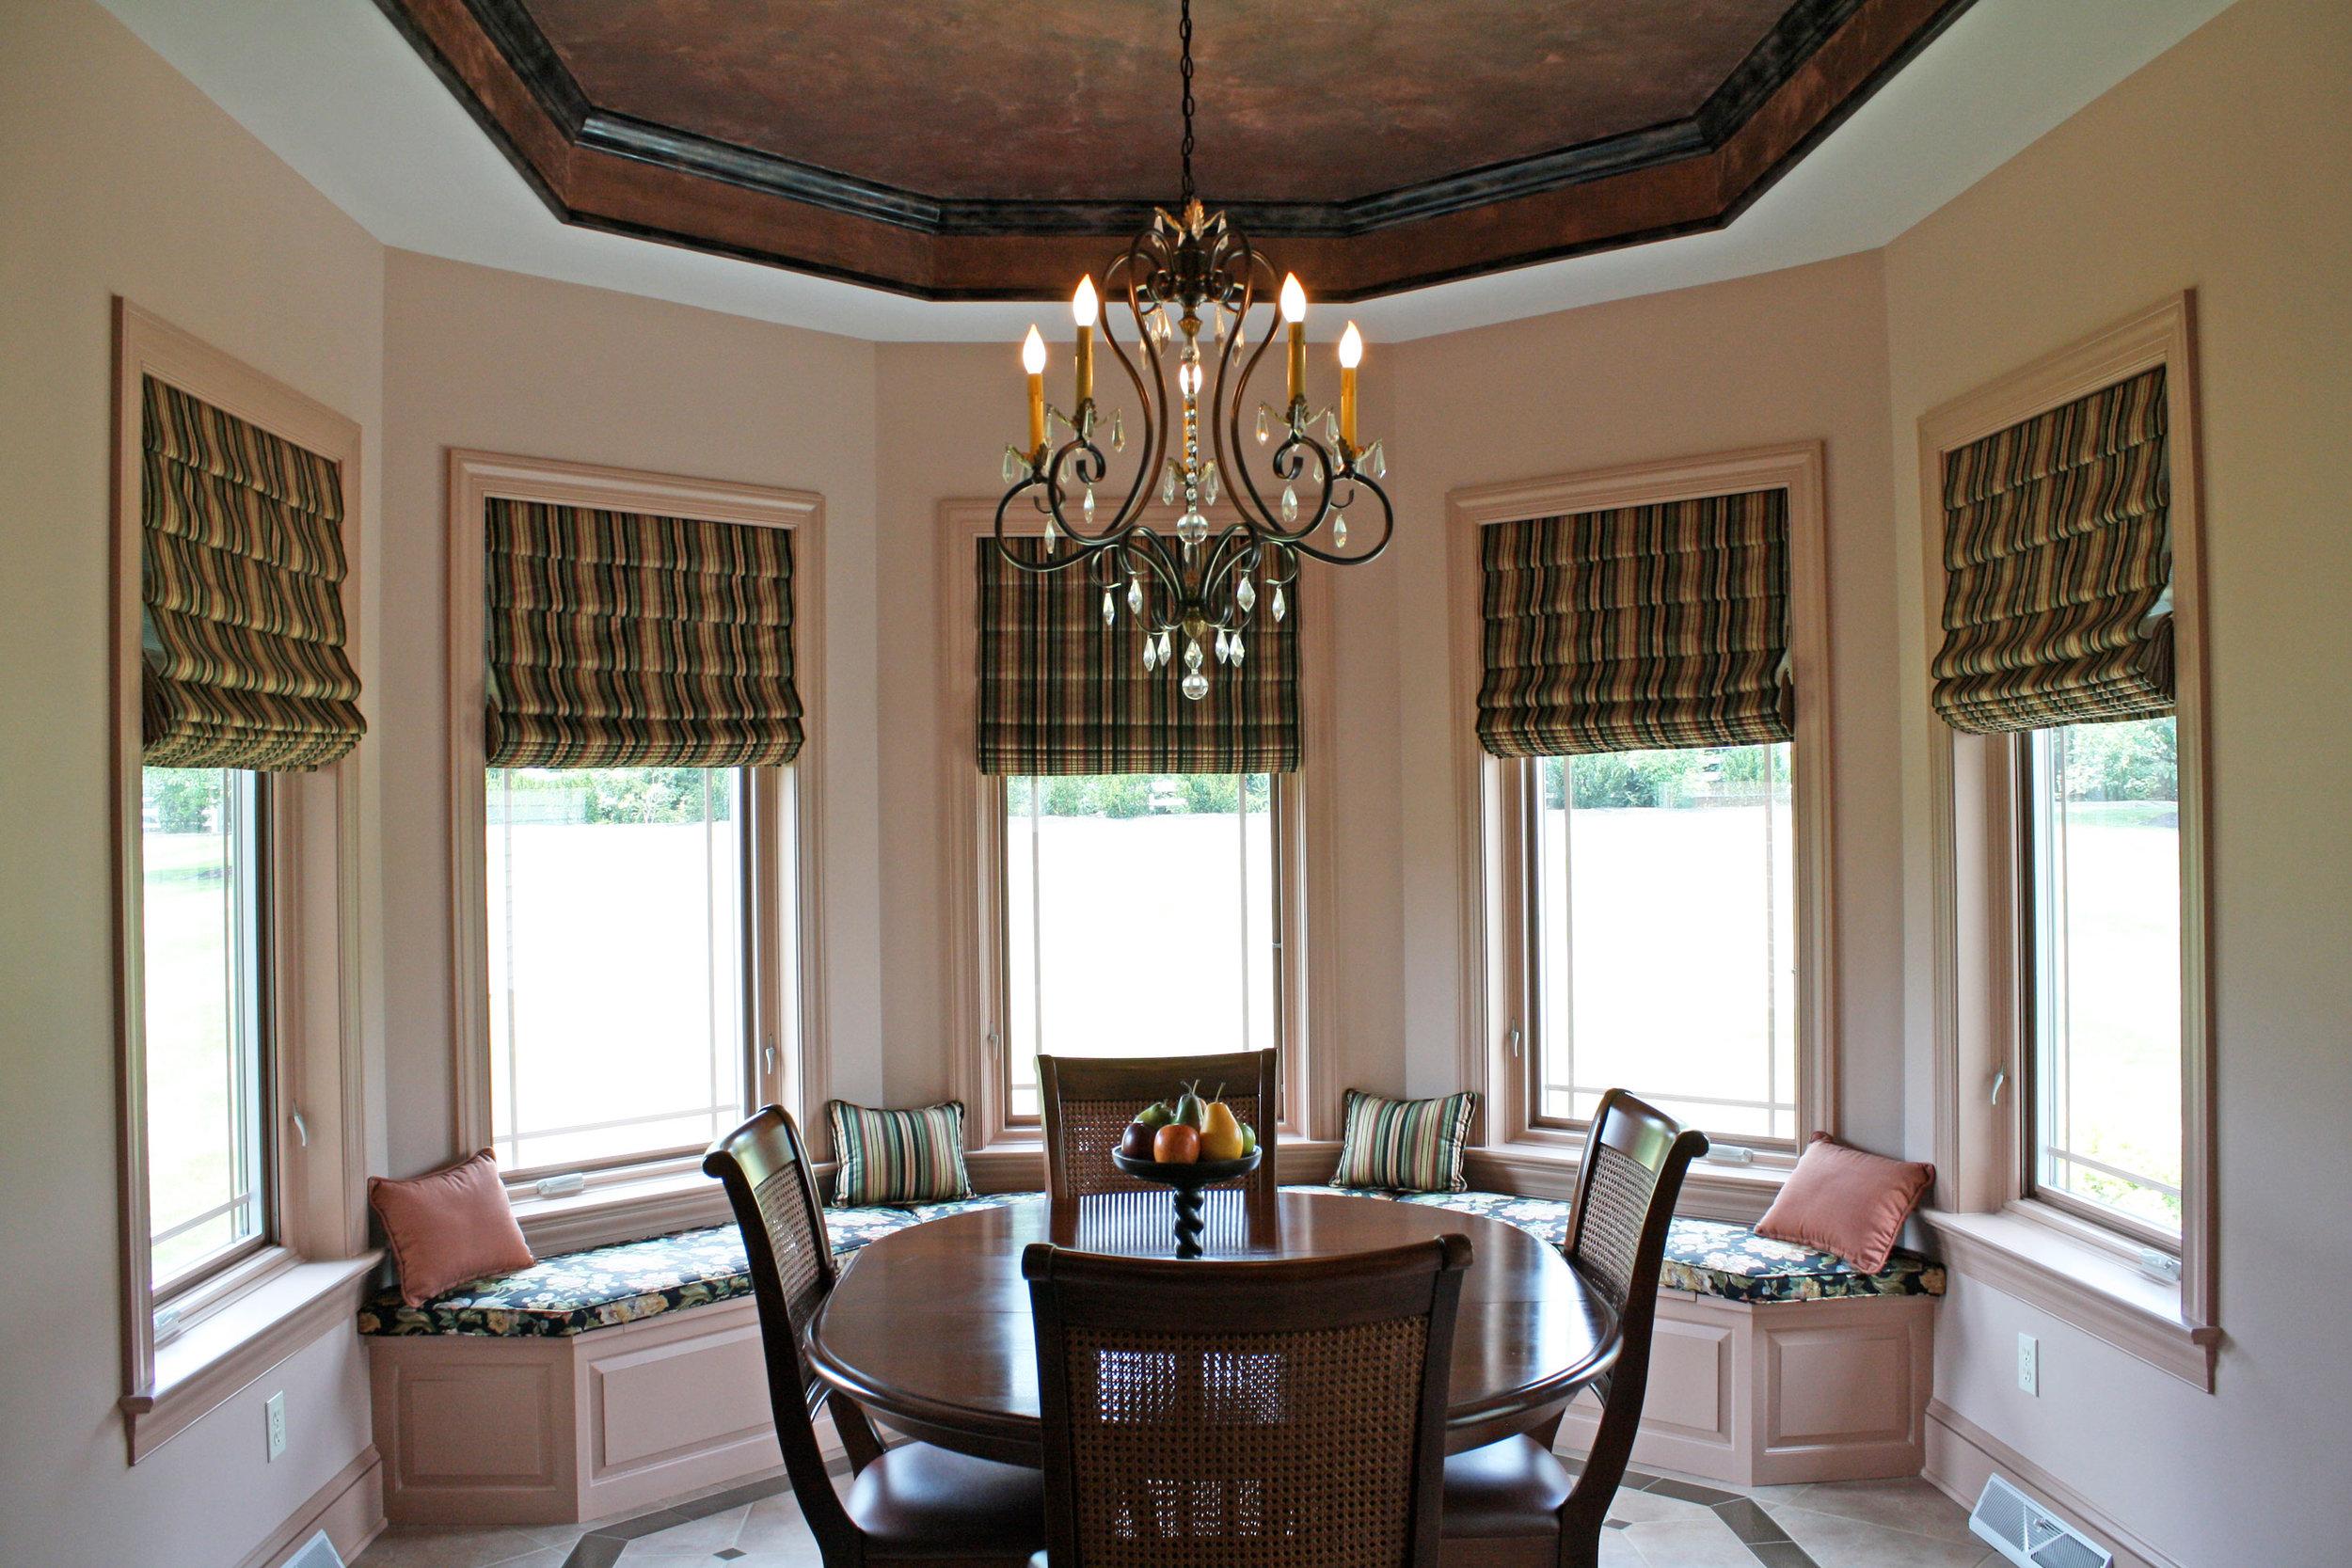 dining-room-bay-window-full-fiew.jpg